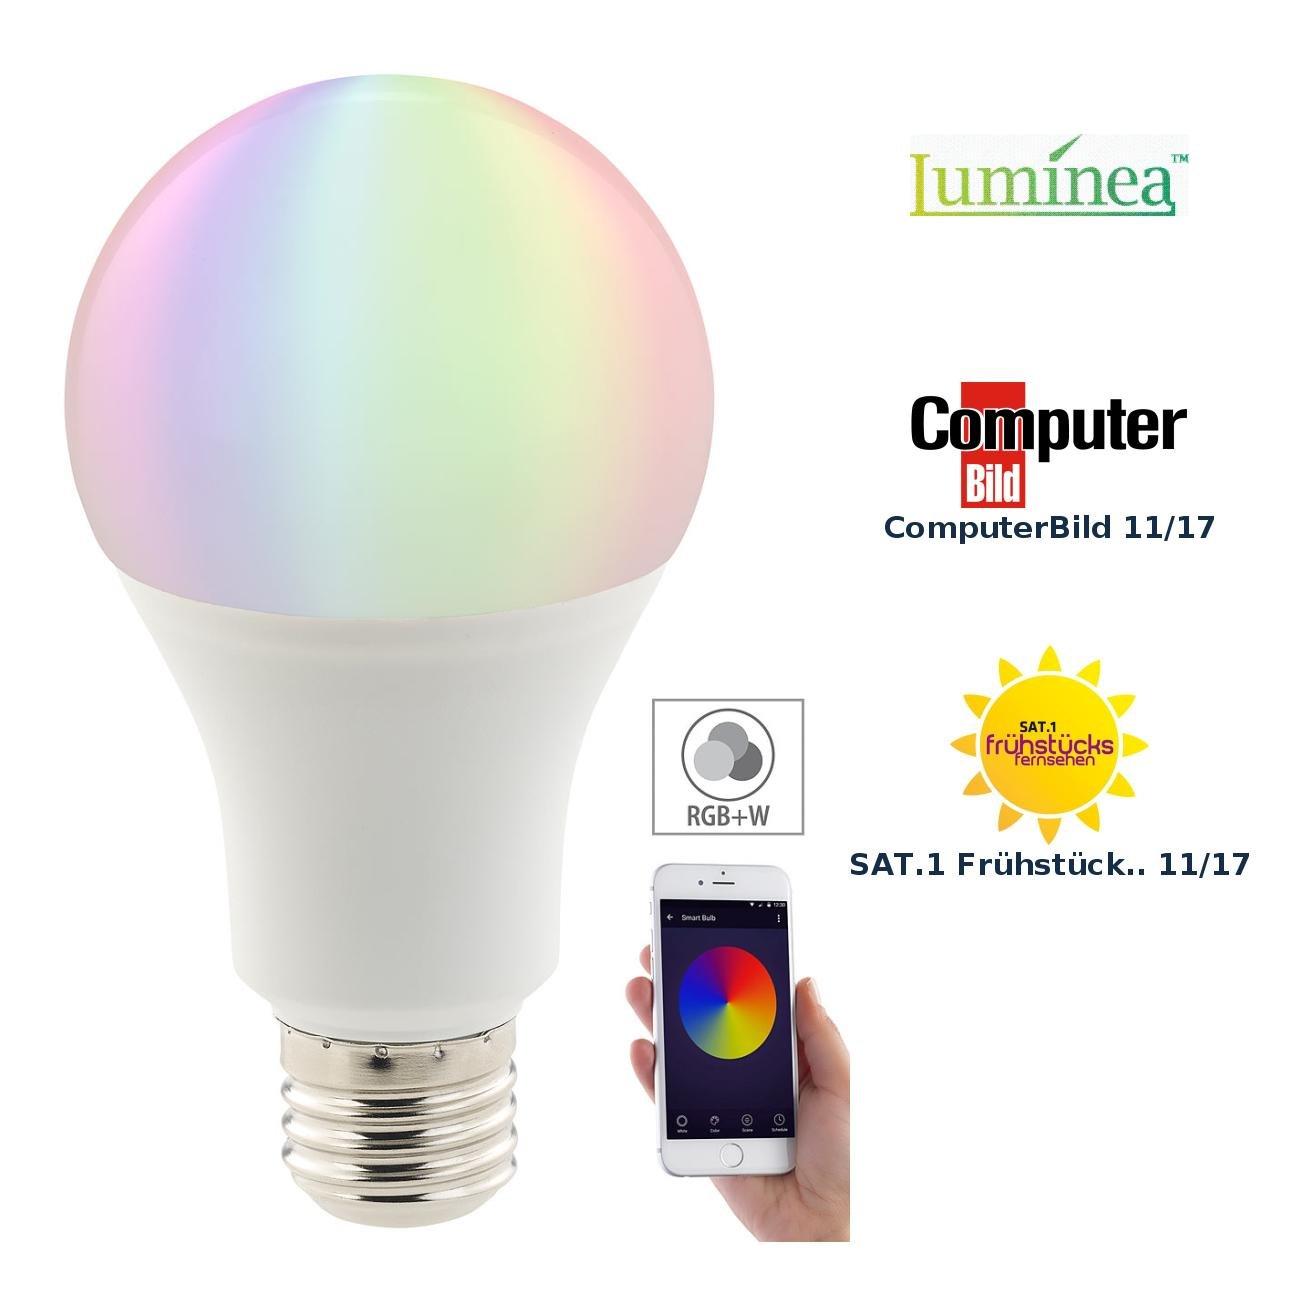 Luminea Home Control WLAN Birne: WLAN-LED-Lampe, komp. mit  Alexa & Google Assistant, E27, RGBW (WLAN Glü hbirne)